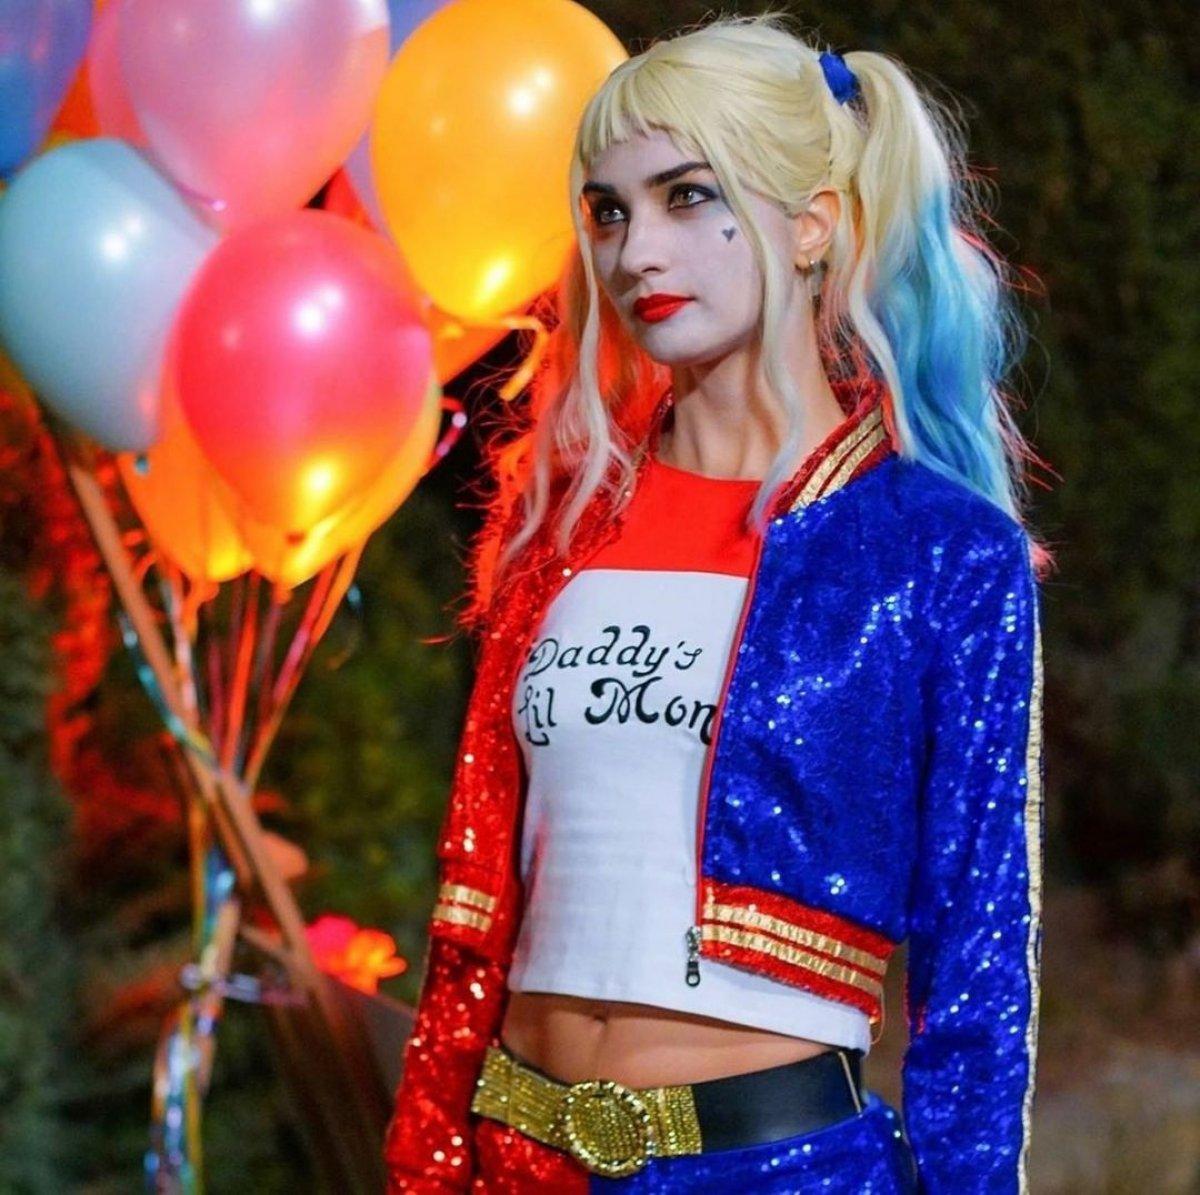 Tuba Büyüküstün Harley Quinn